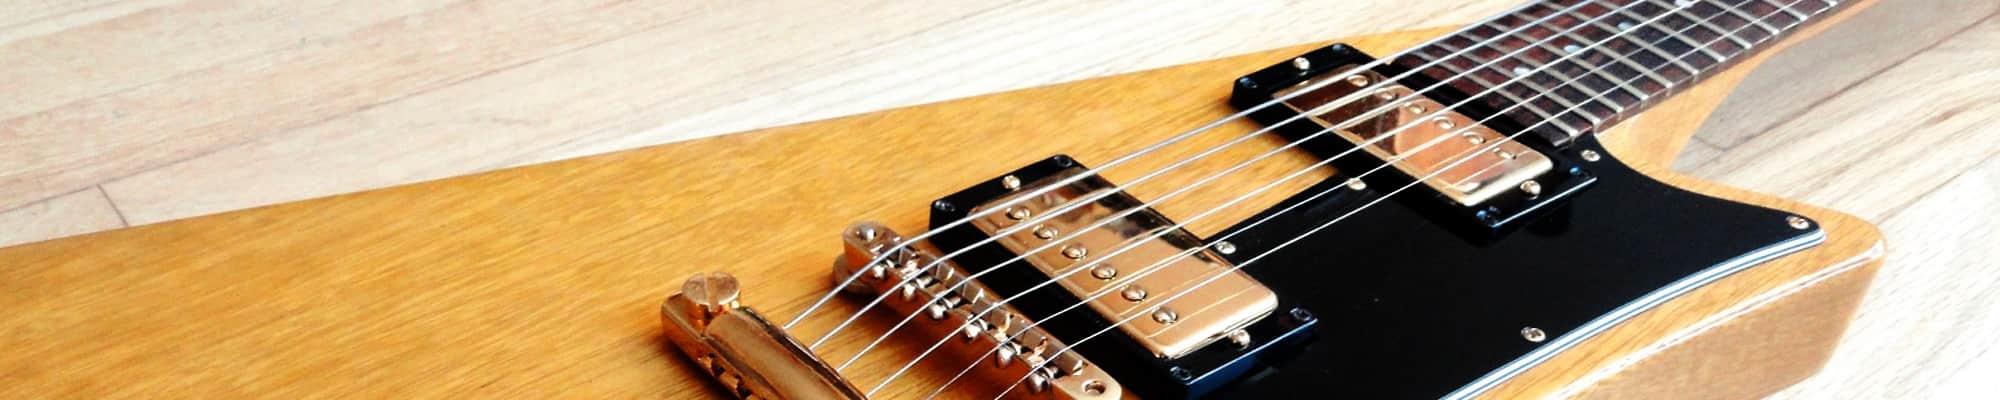 Datant Kalamazoo guitares